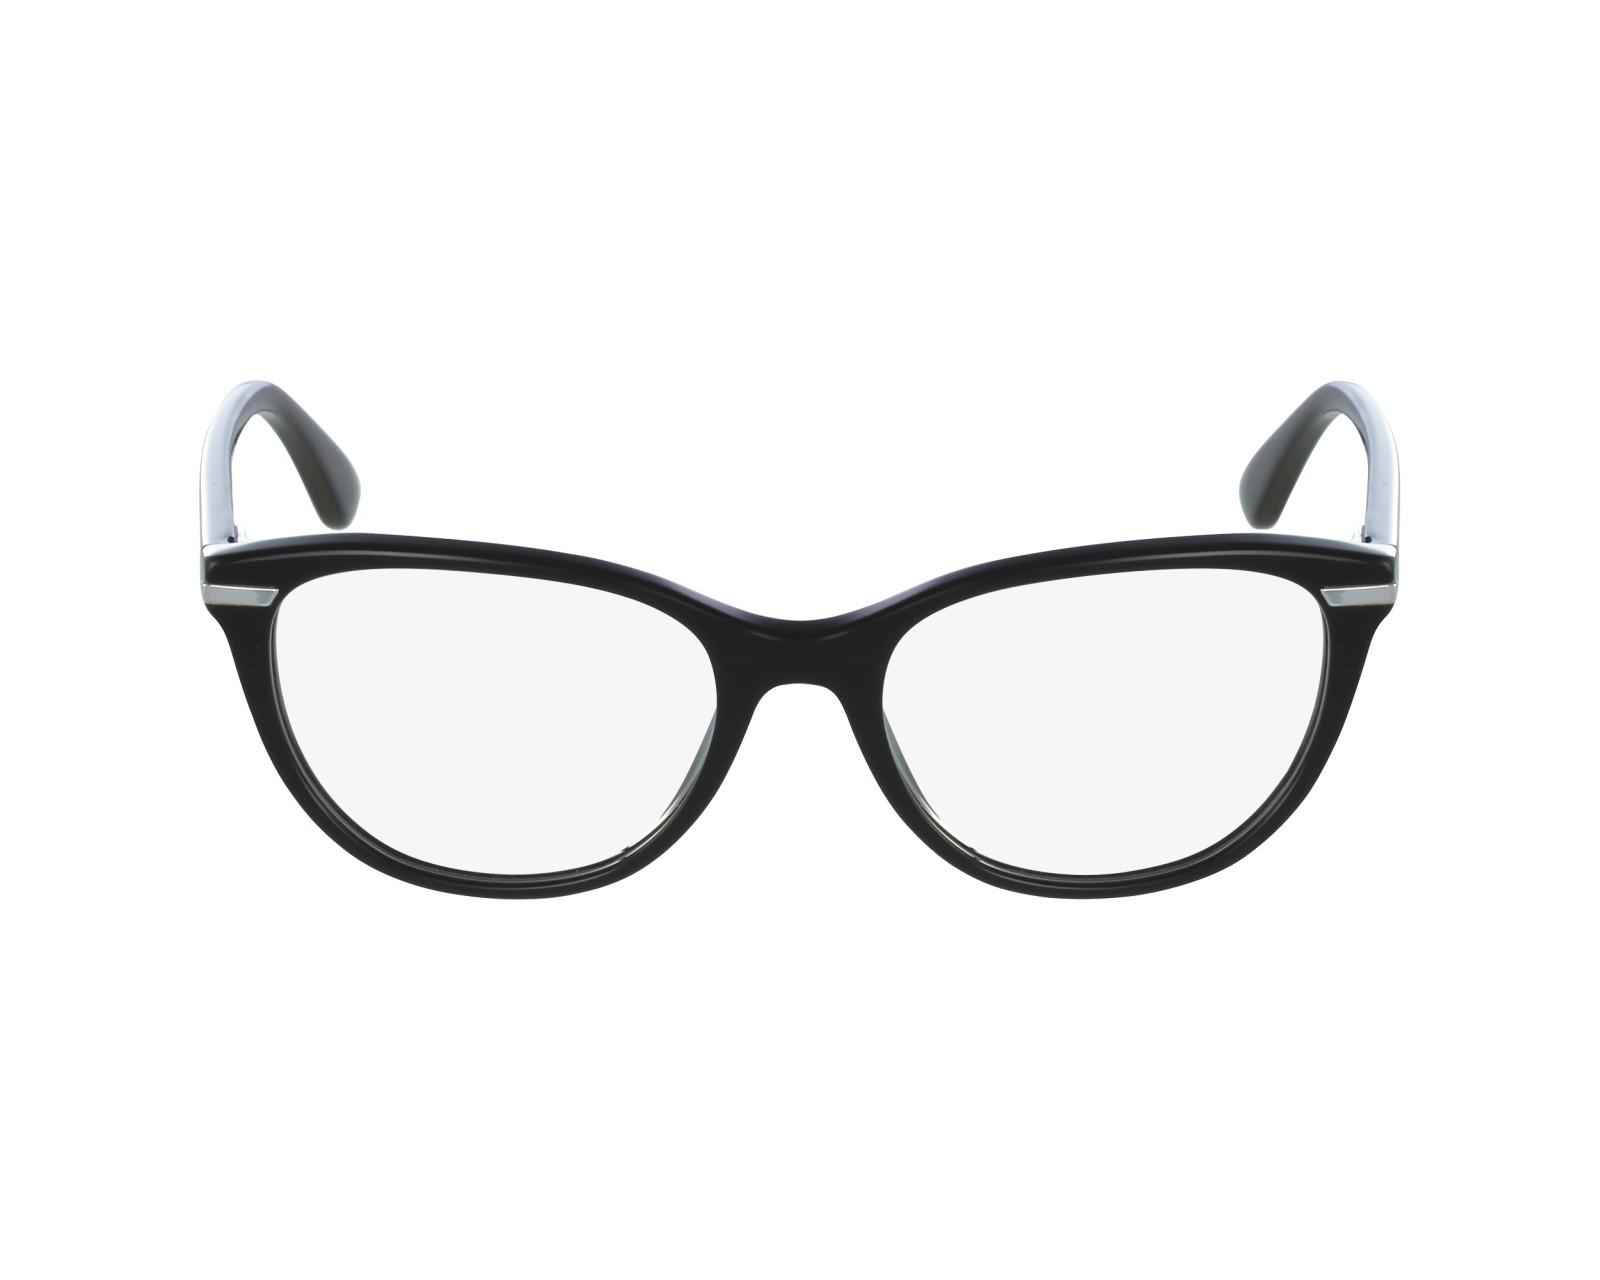 721aedf6d7e eyeglasses Vogue VO-2937 W44 51-17 Black Silver profile view